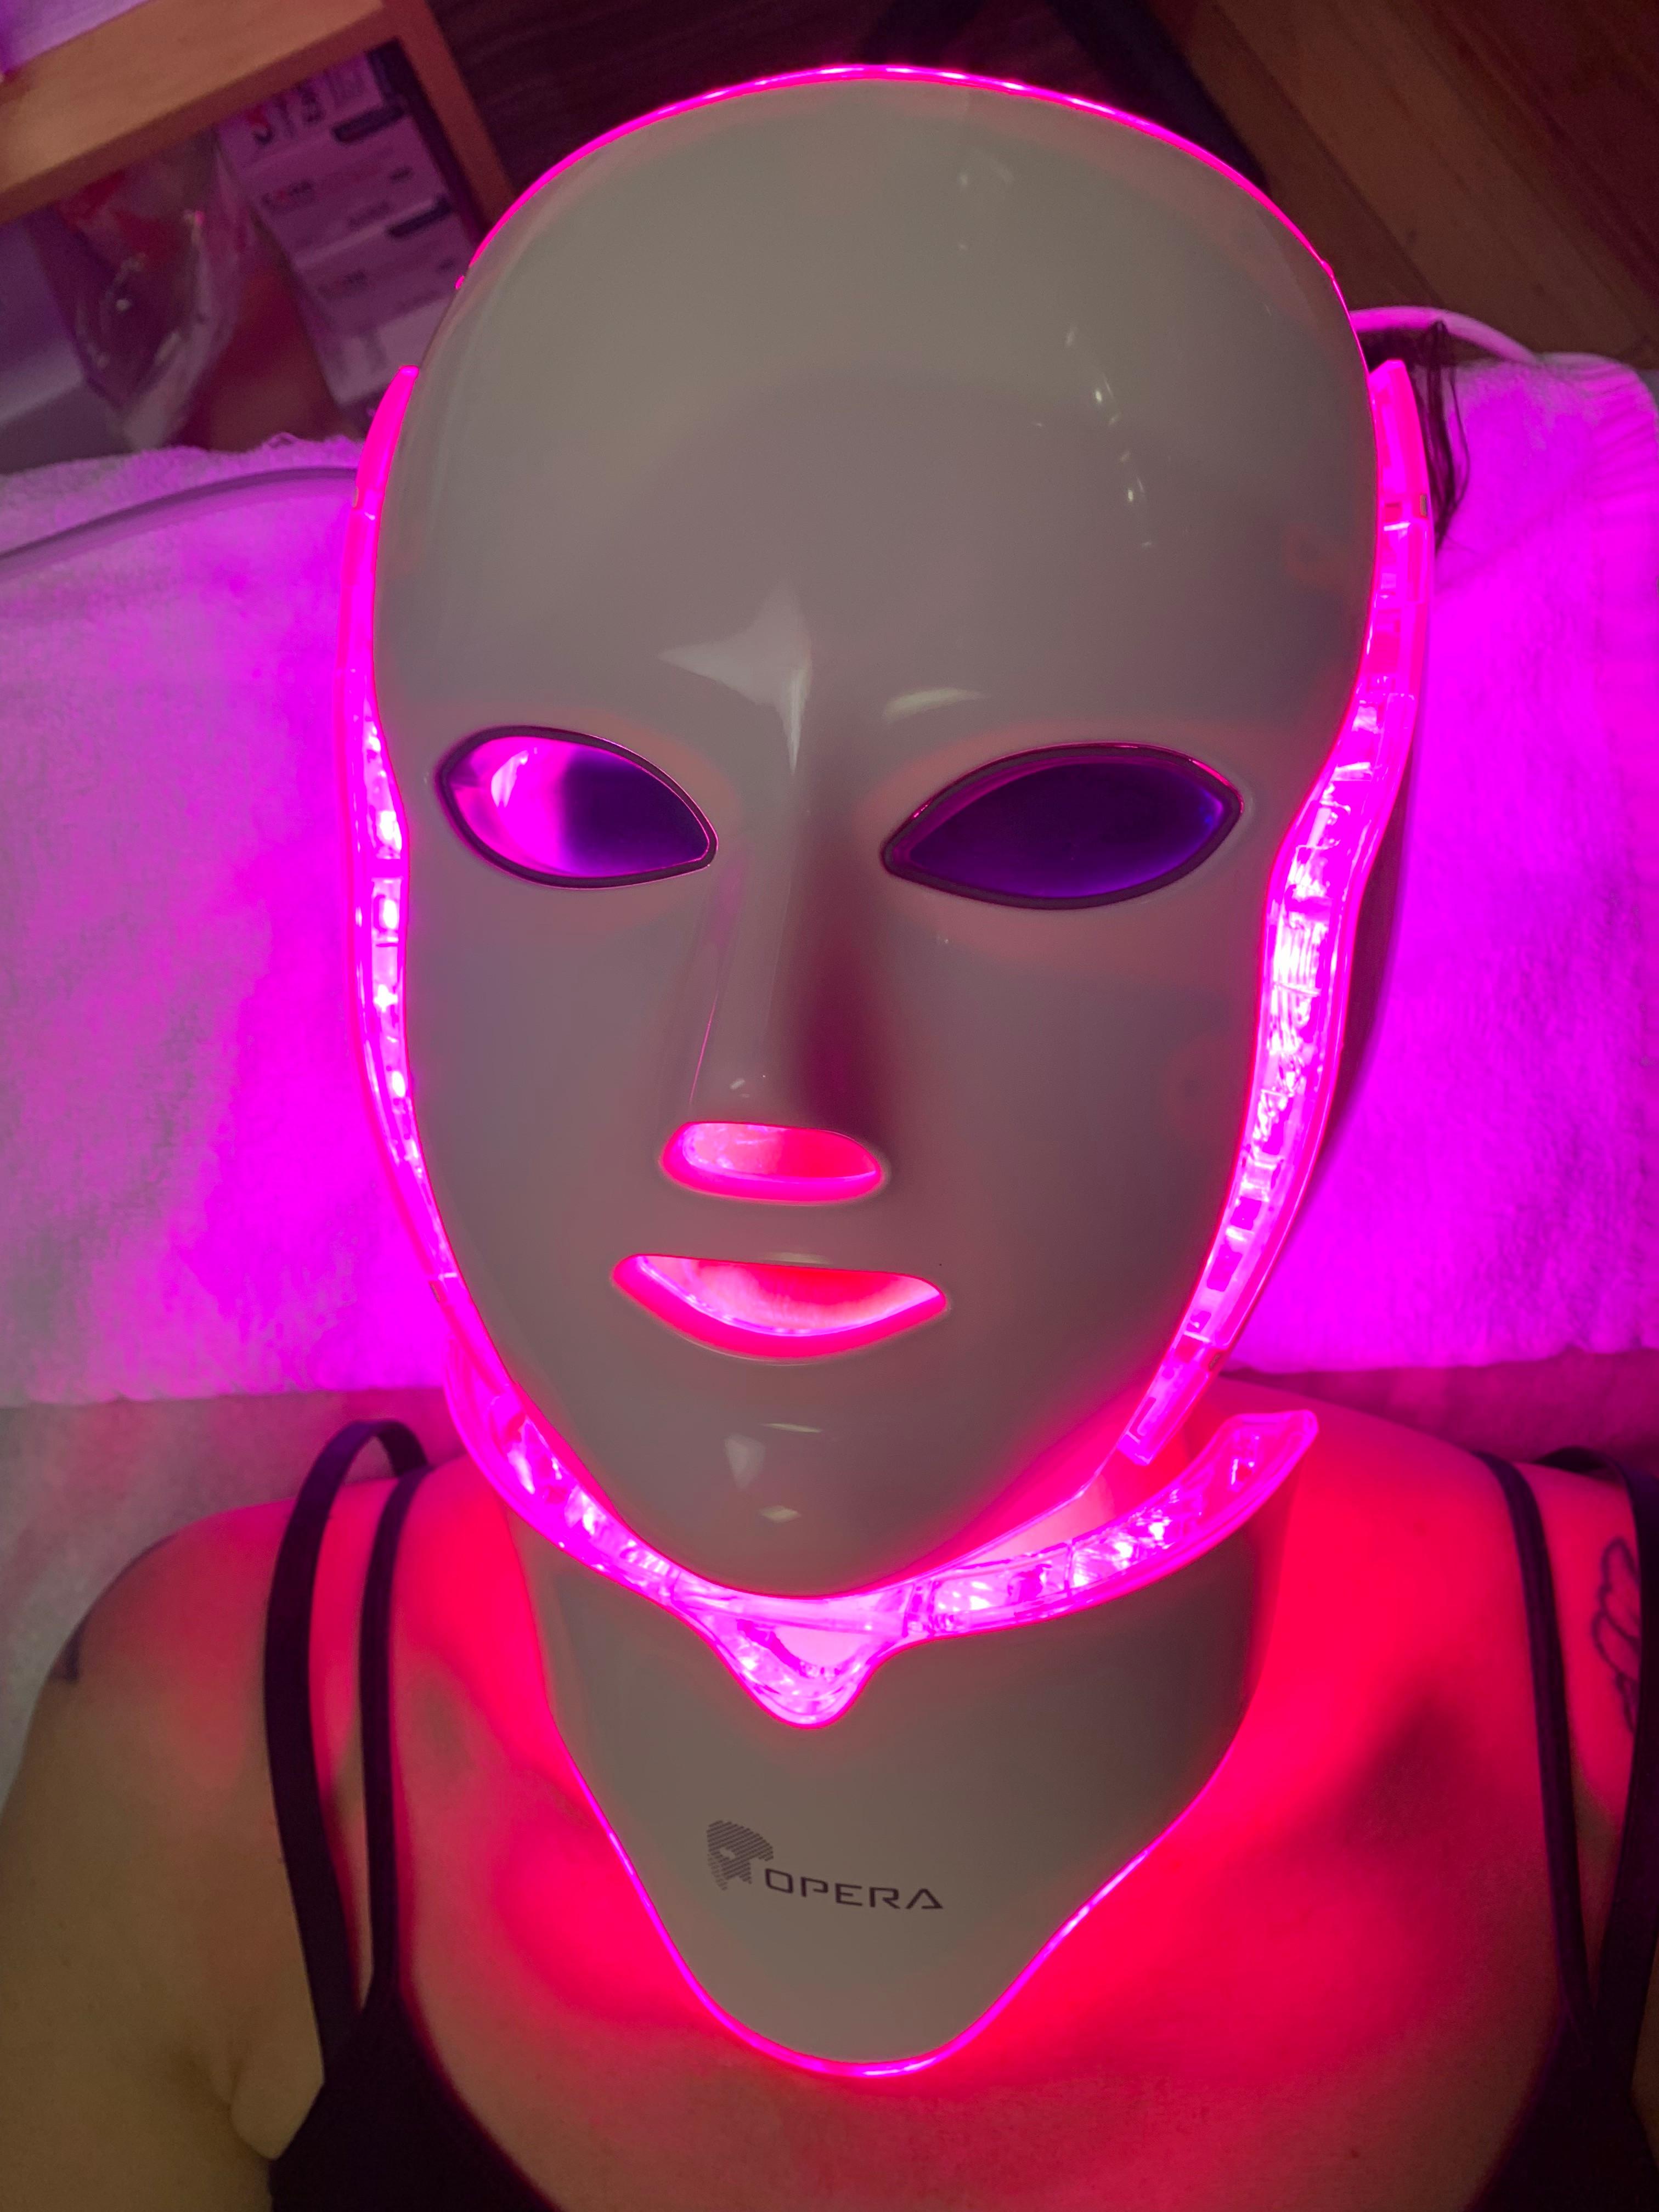 OPERA LED/Galvonic Mask $55